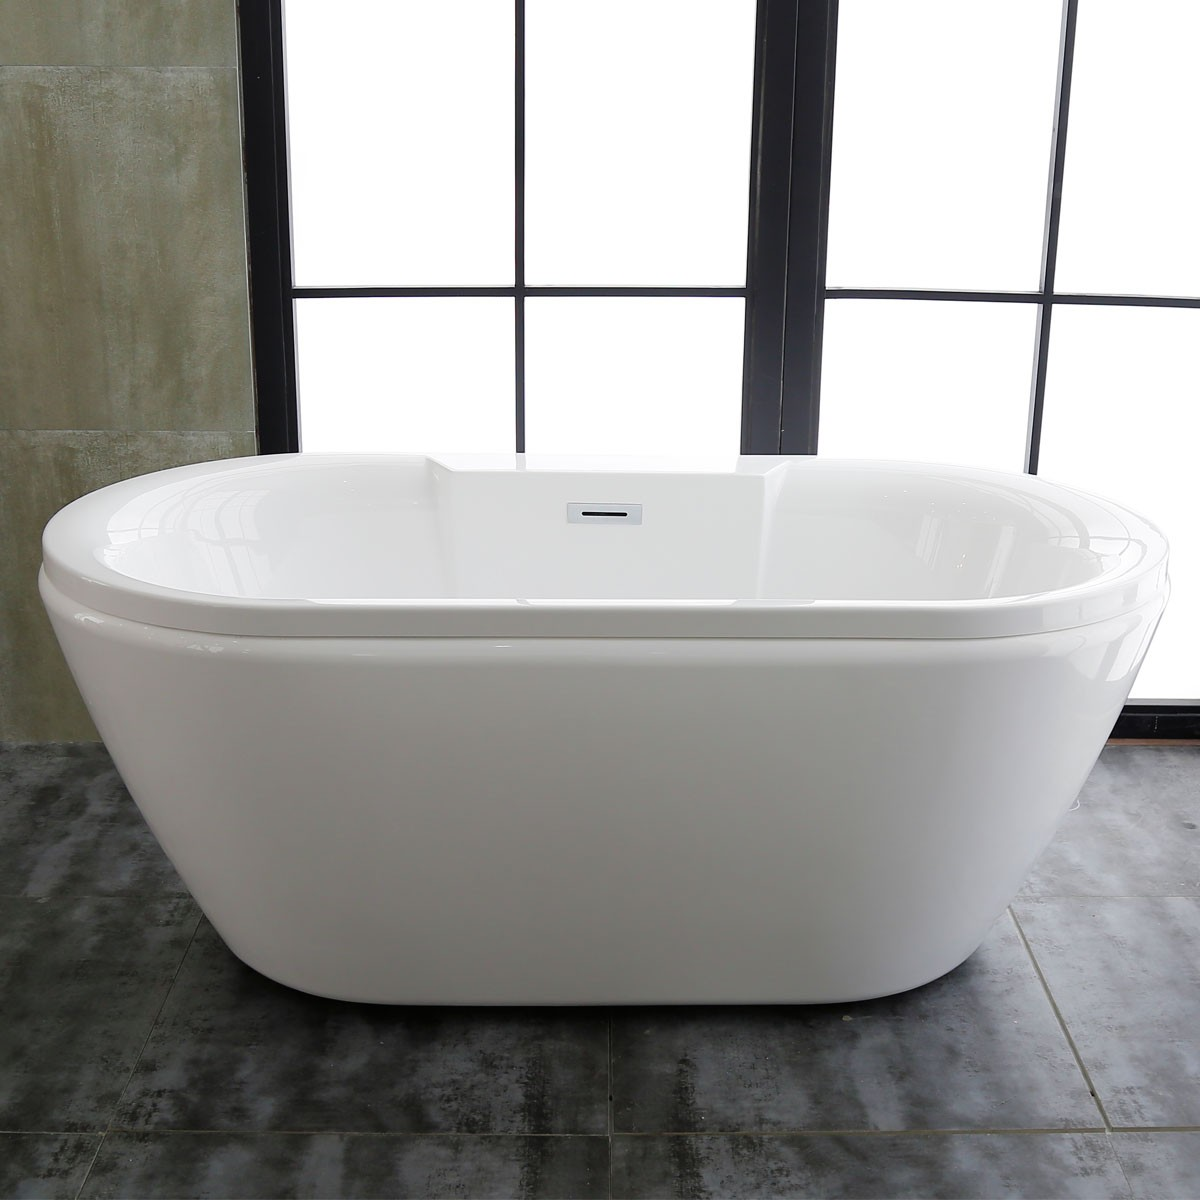 60 In Freestanding Bathtub - Acrylic White (DK-MEC3061)